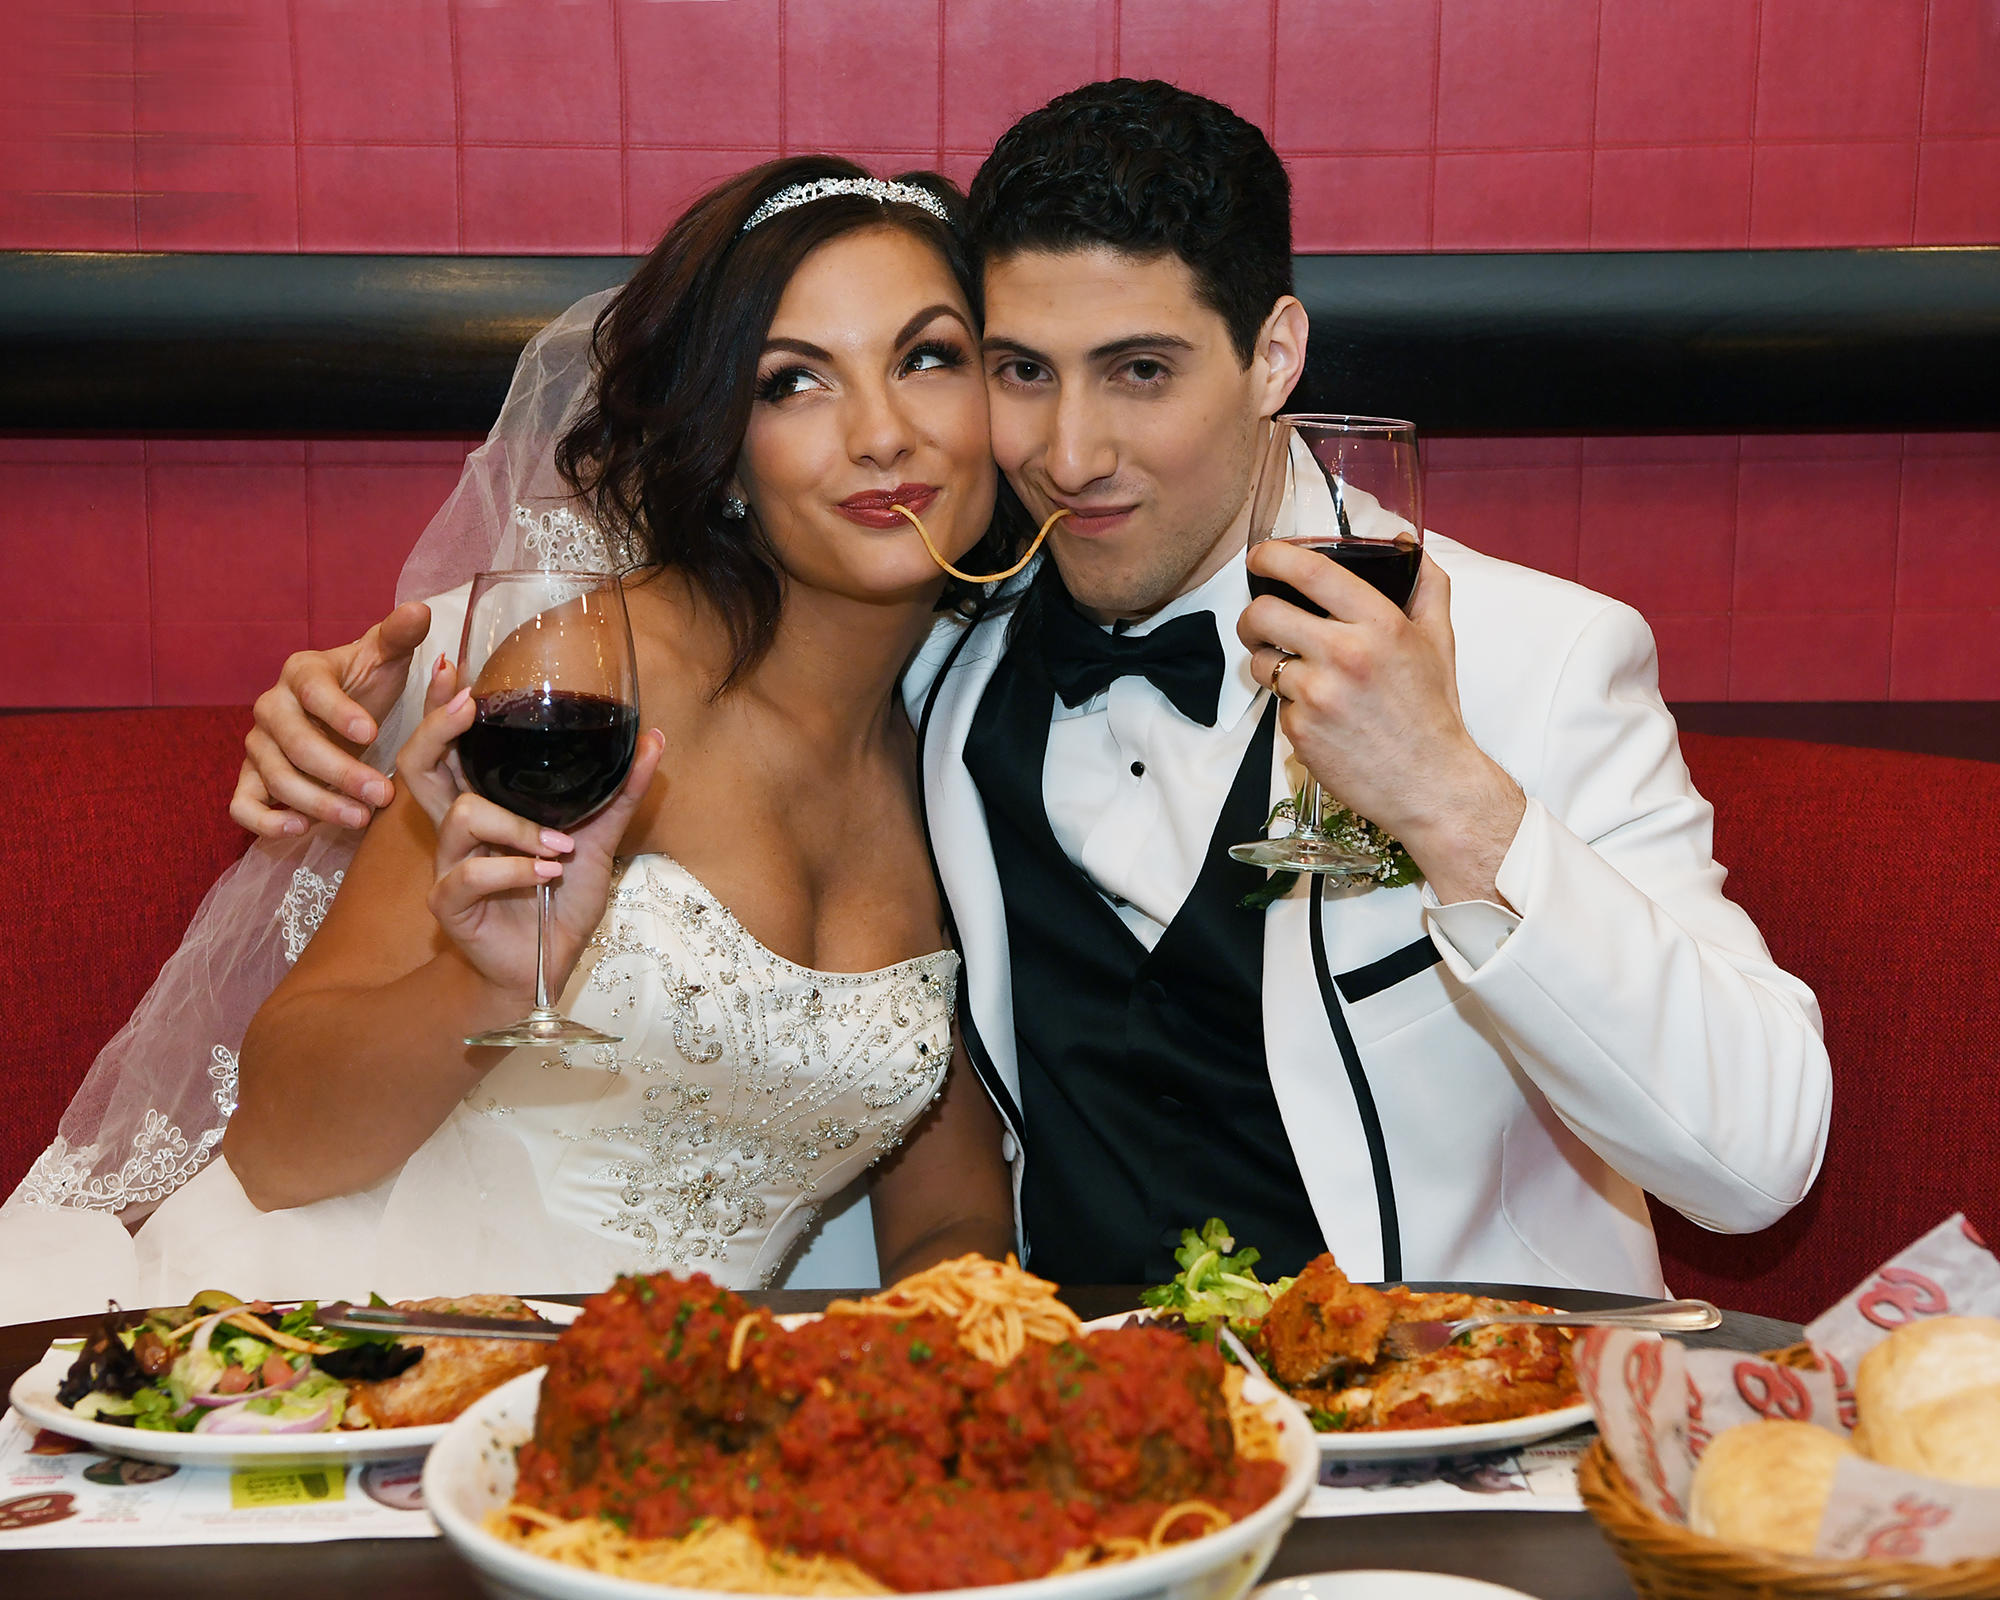 Tony N' Tina's Wedding image 6